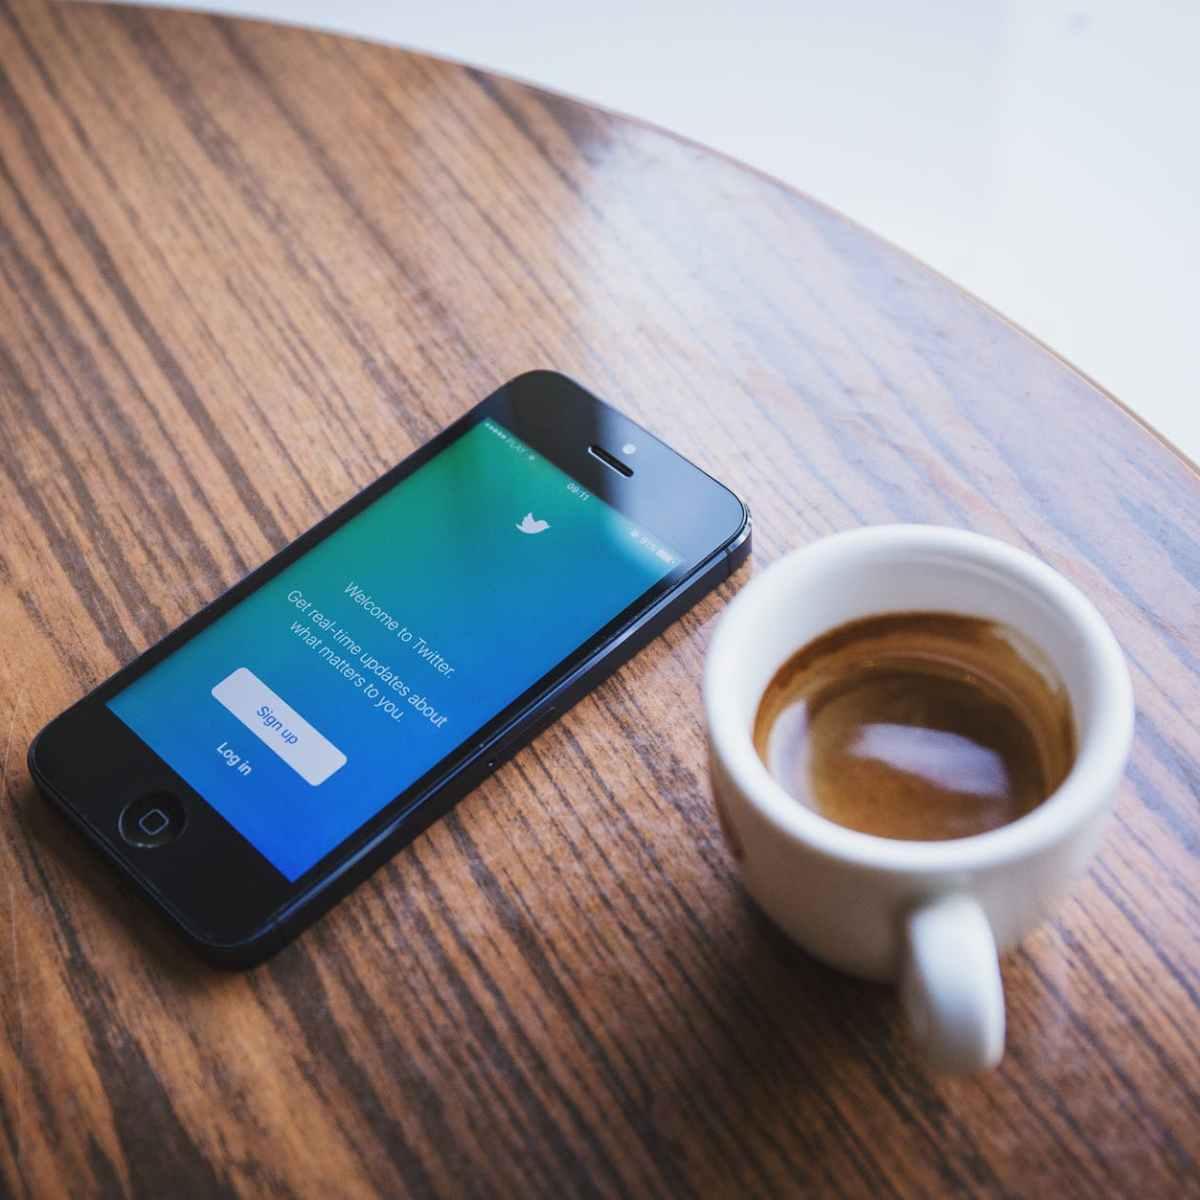 NPLUSG - Twitter Features